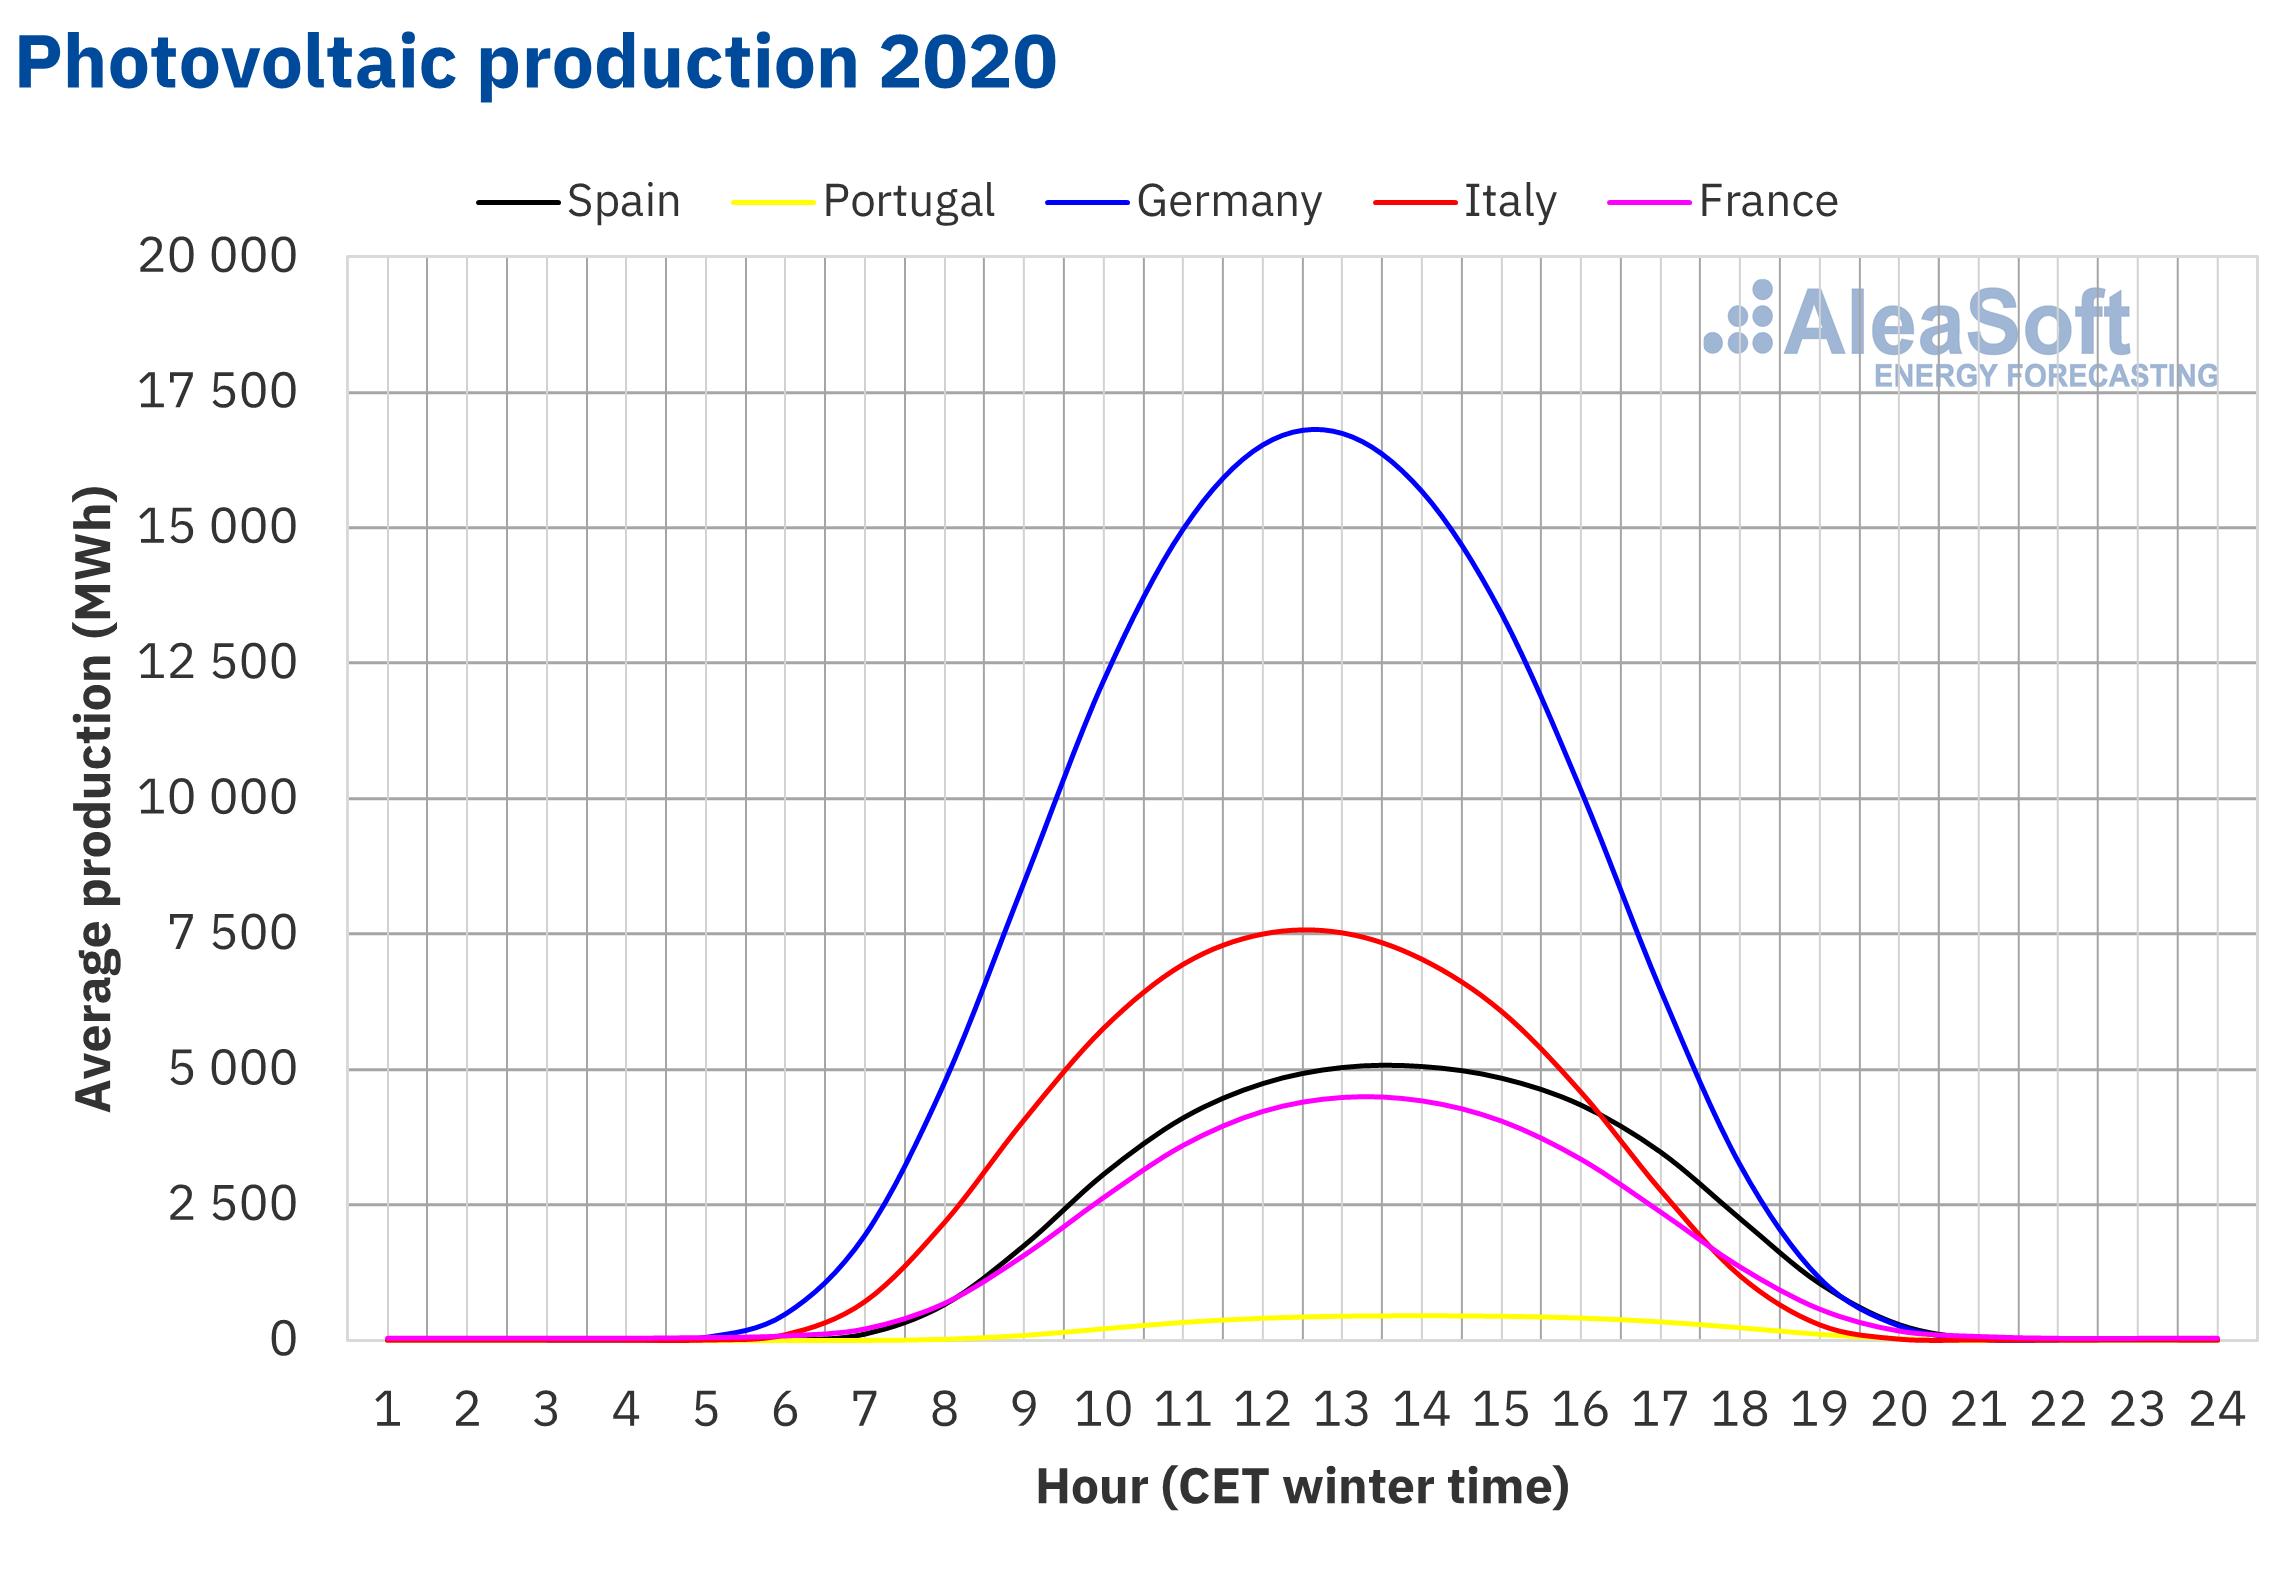 AleaSoft - Solar photovoltaic production profile Europe 2020